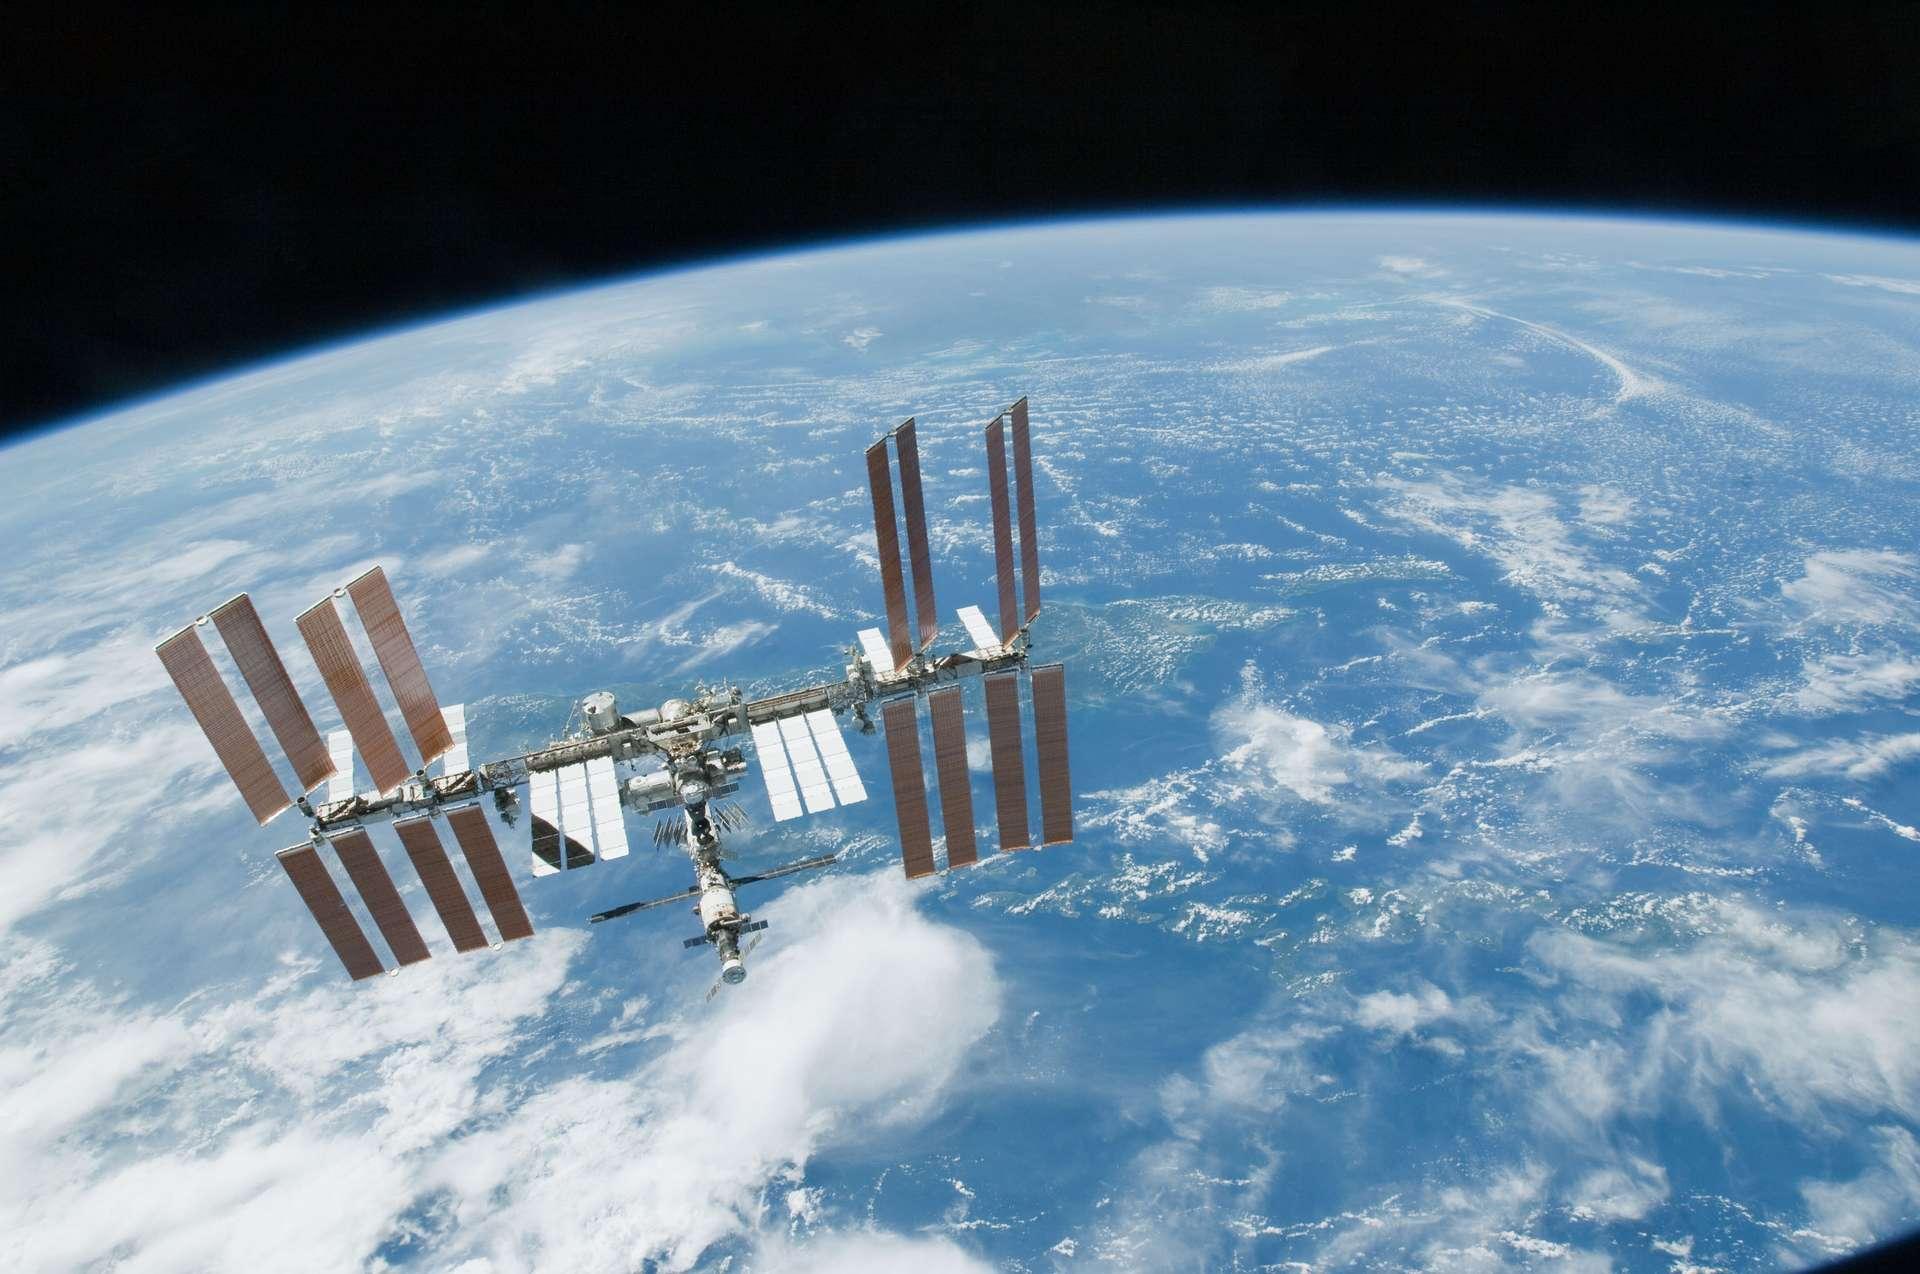 La Station spatiale internationale (ISS) survolant la Terre. © Nasa